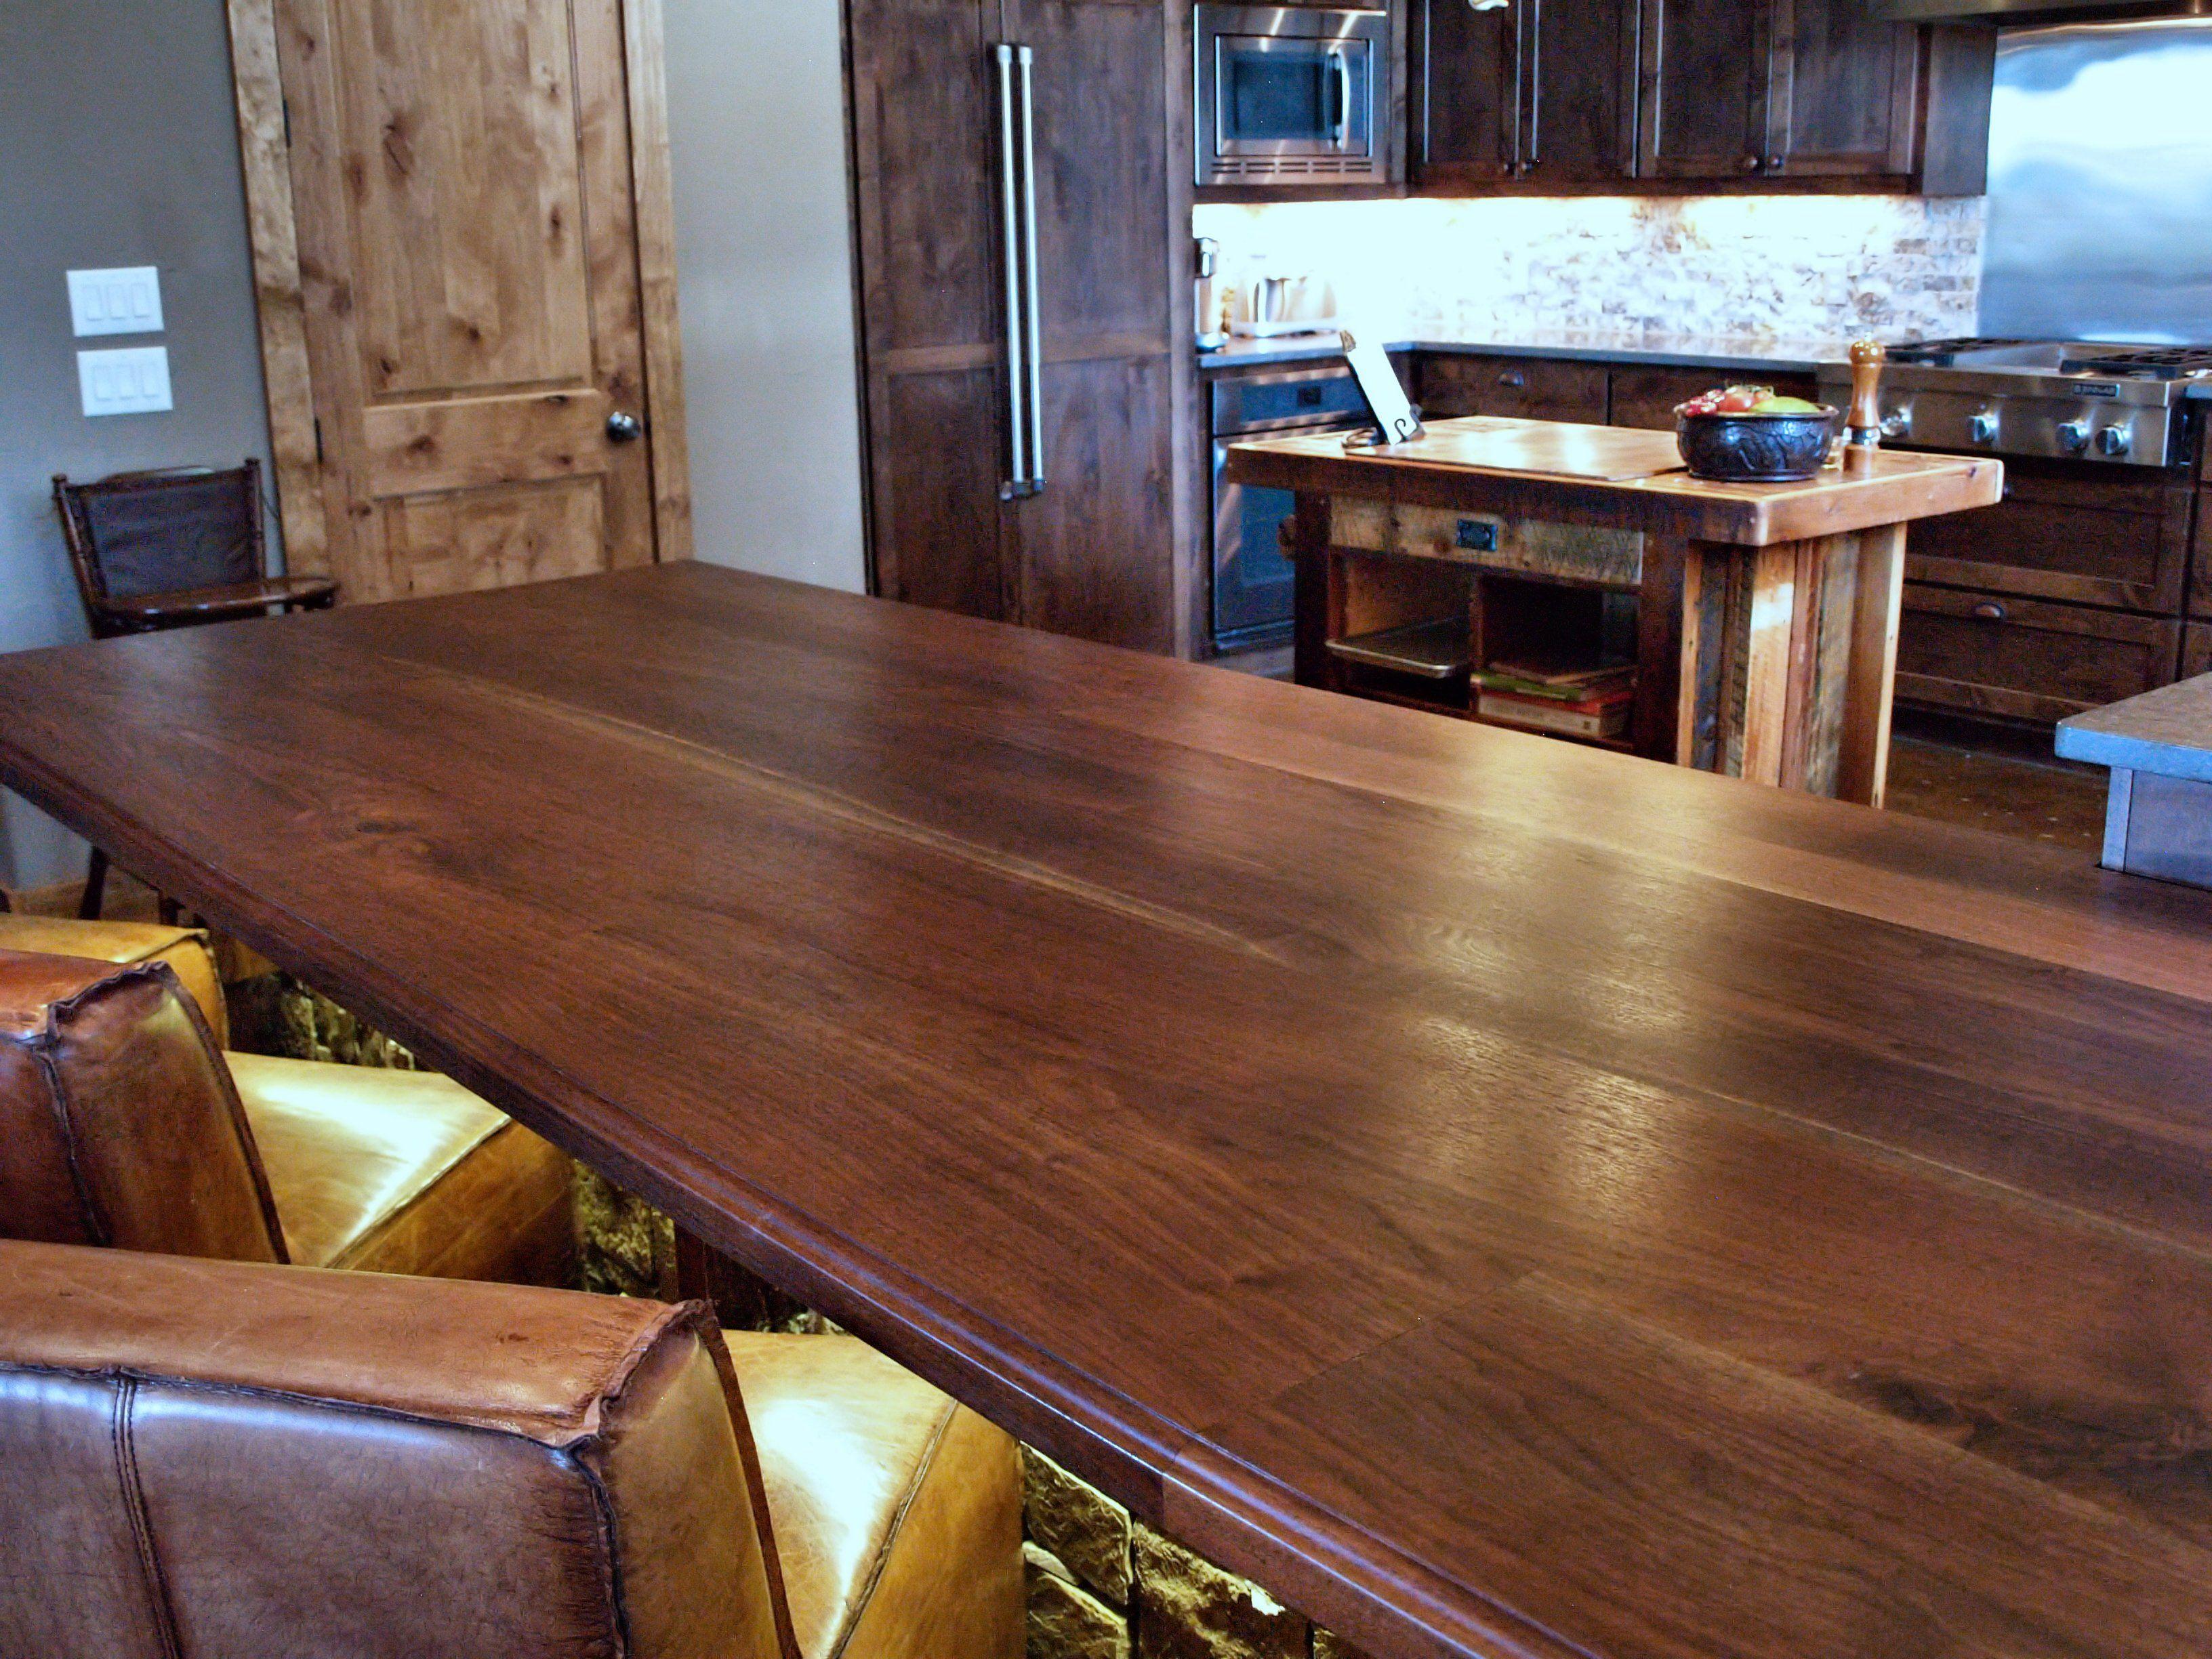 Devos custom woodworking tx walnut wood countertop photo for Wood slab countertops